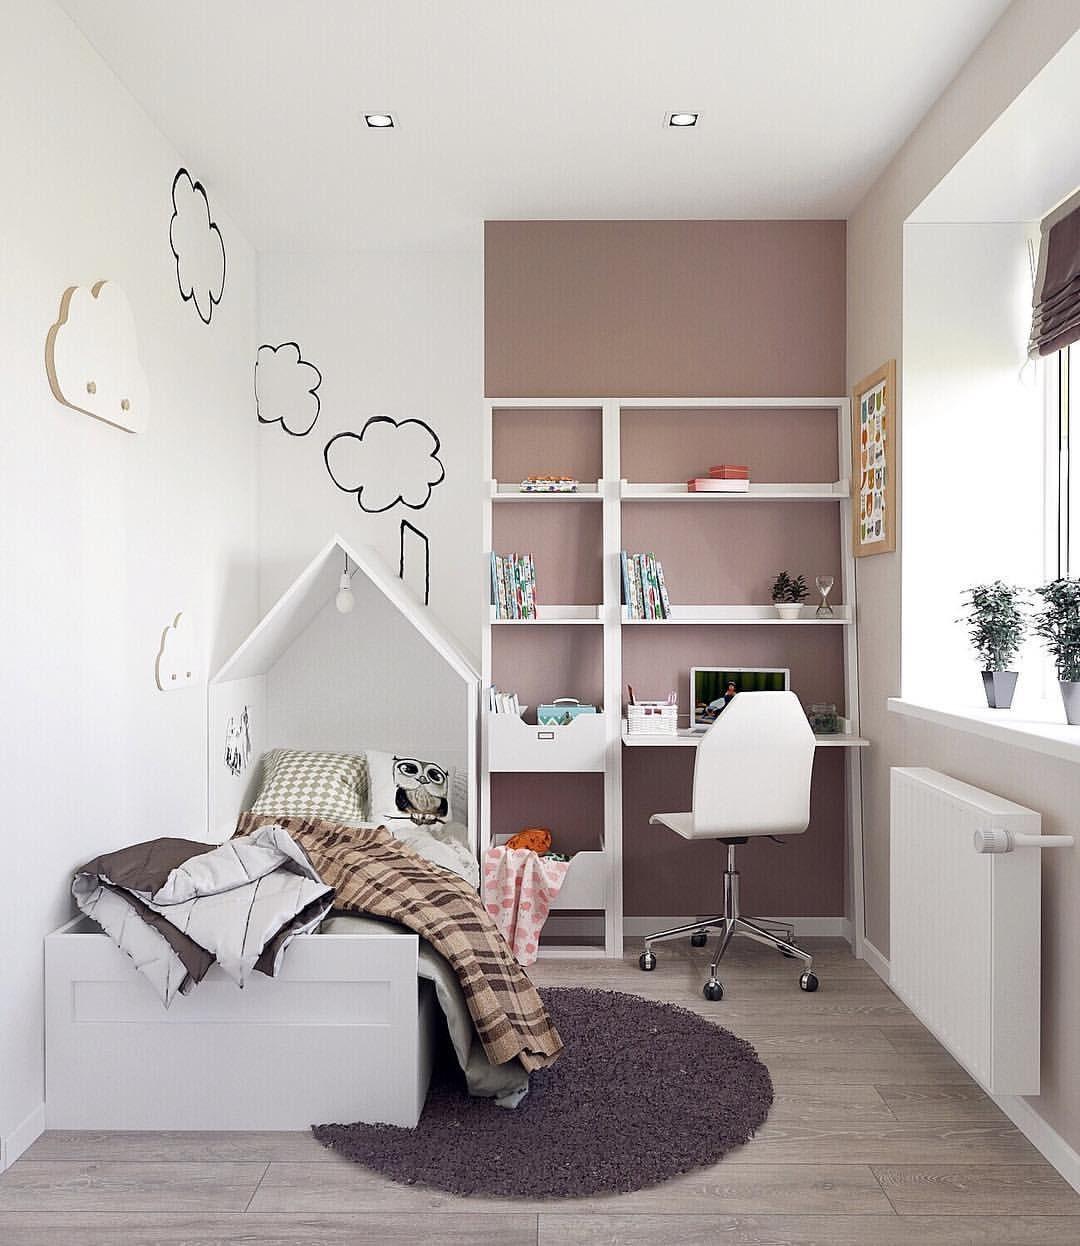 981 Otmetok Nravitsya 68 Kommentariev Dizajner Dekorator Minsk Home And Me V Instagram Pust Skromnyj Metrazh Detskoj Komnaty Nikogd Room Loft Bed Home